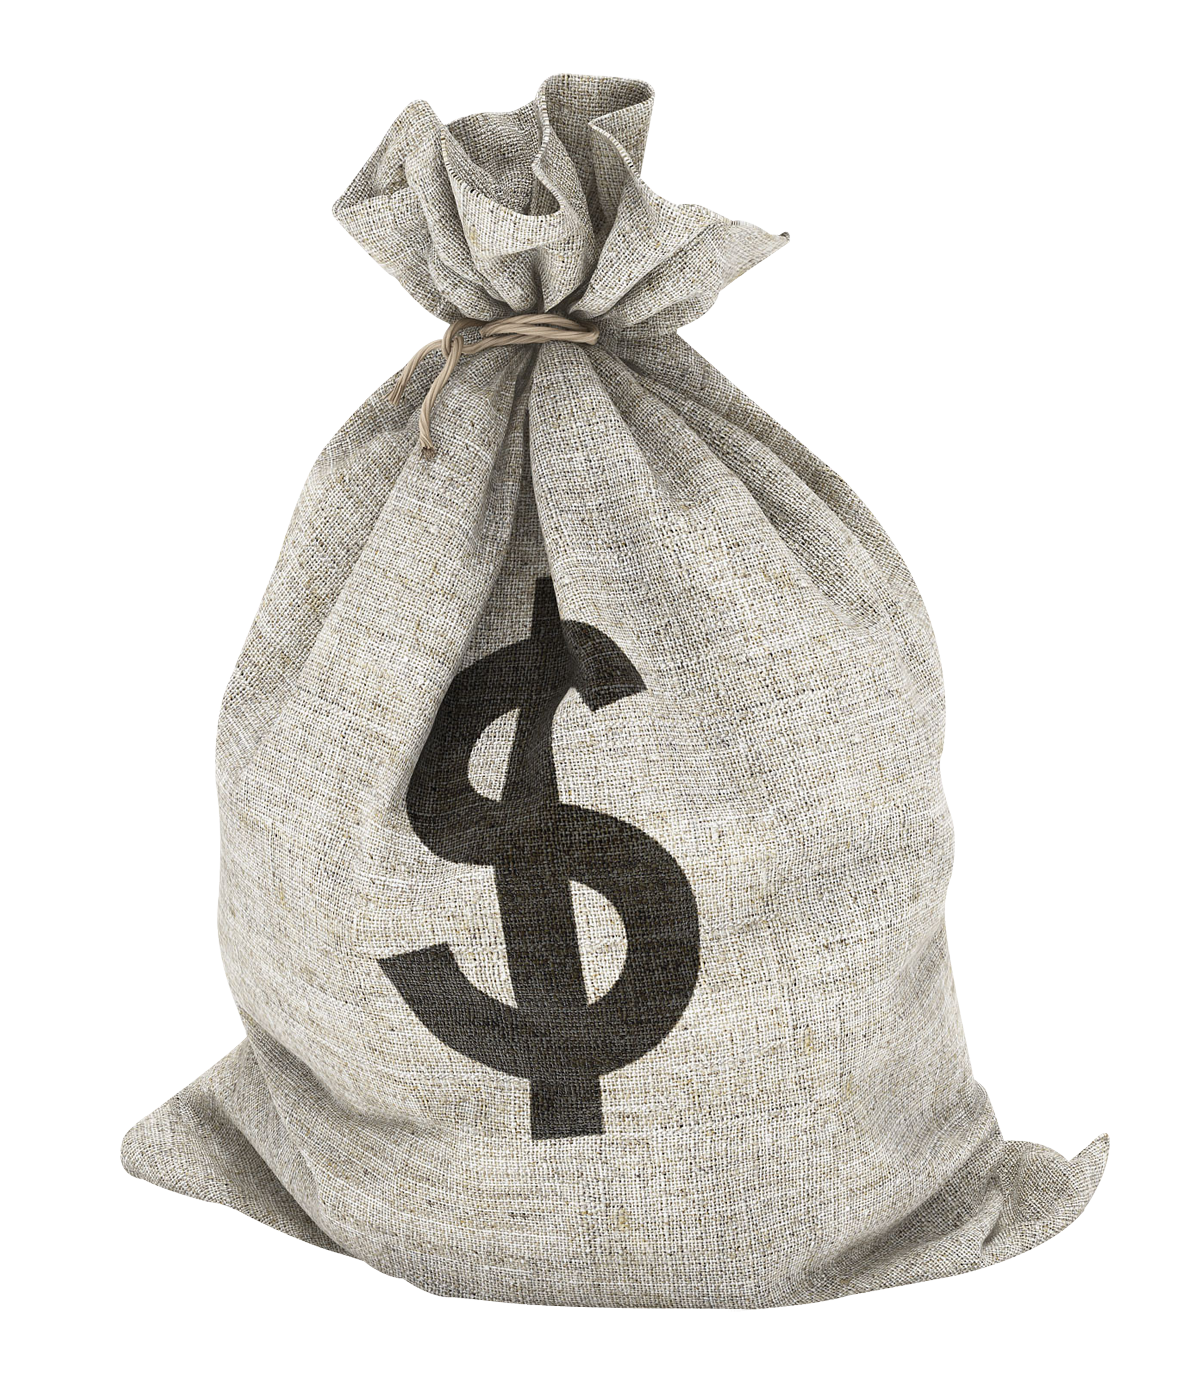 Money bag clipart transparent background clipart royalty free download Money Bag PNG Transparent Image | PNG Transparent best stock photos clipart royalty free download